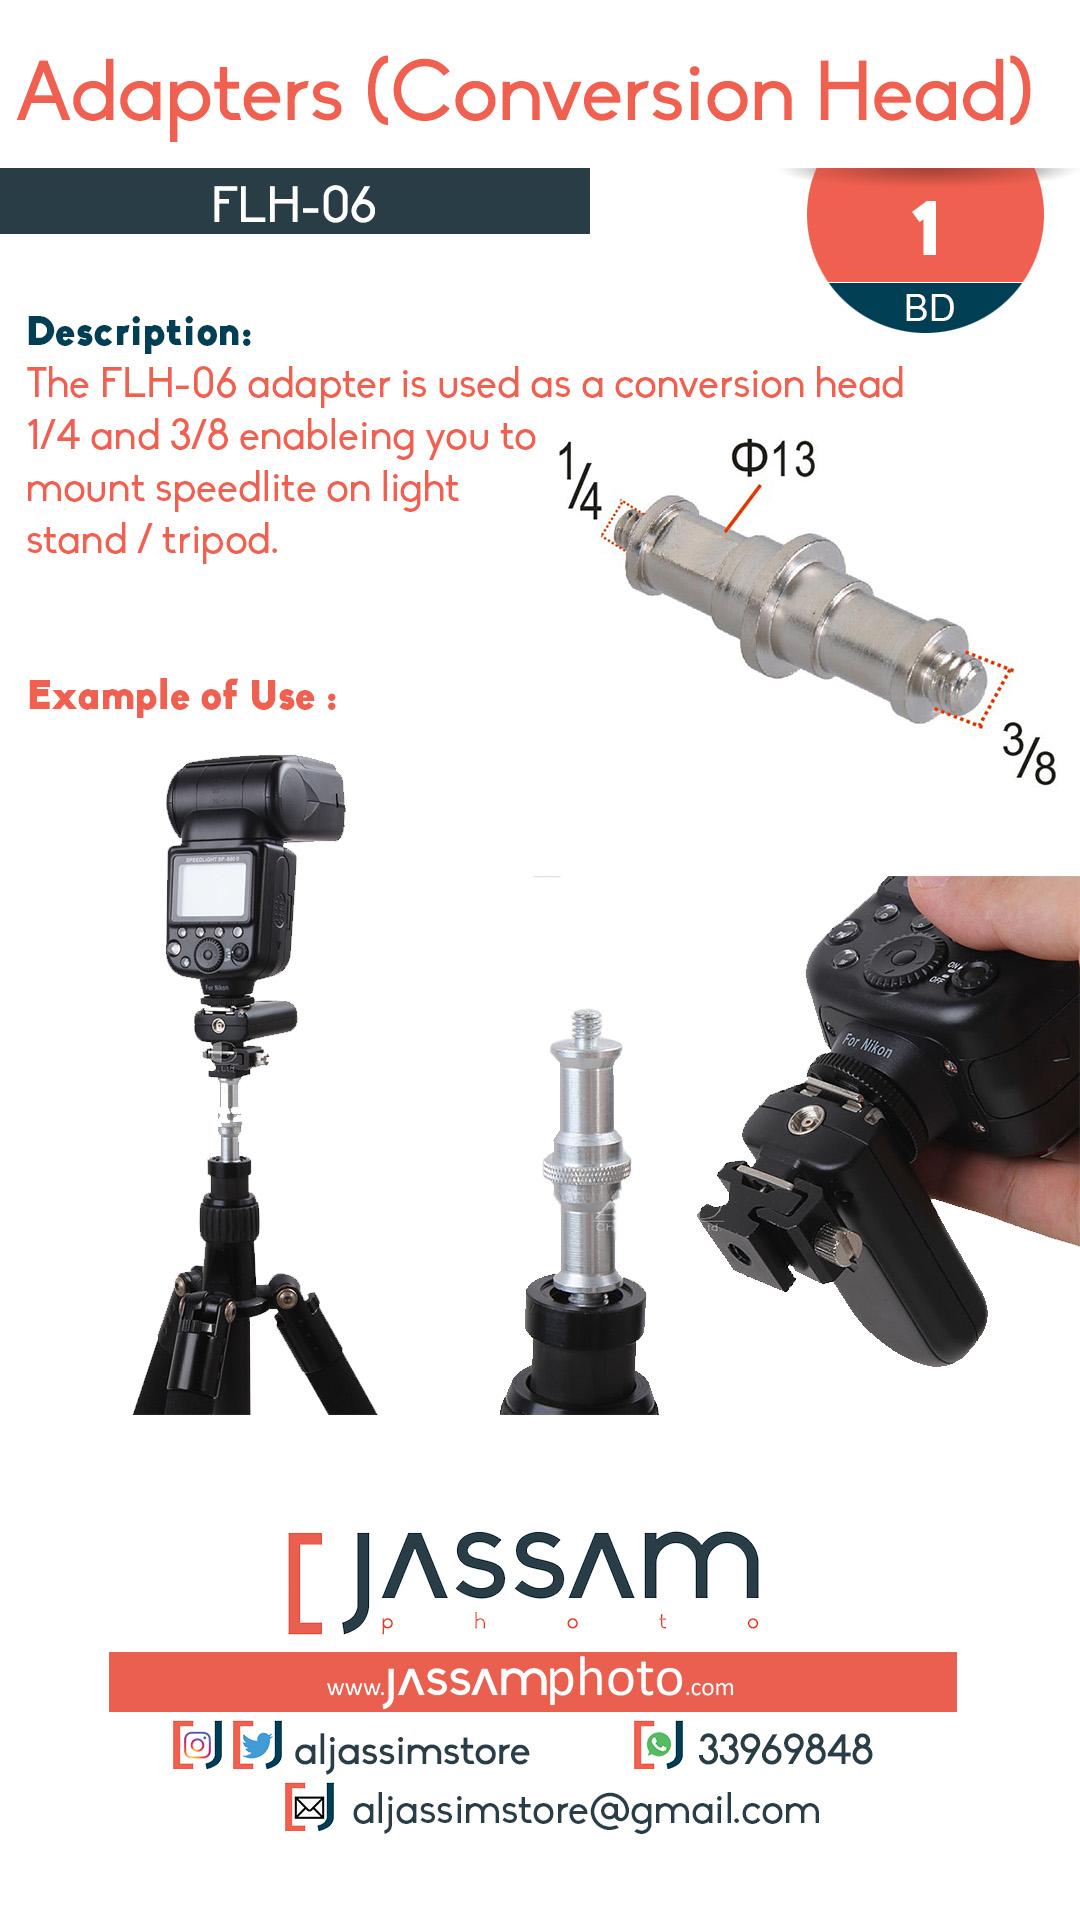 Adapter FLH-06